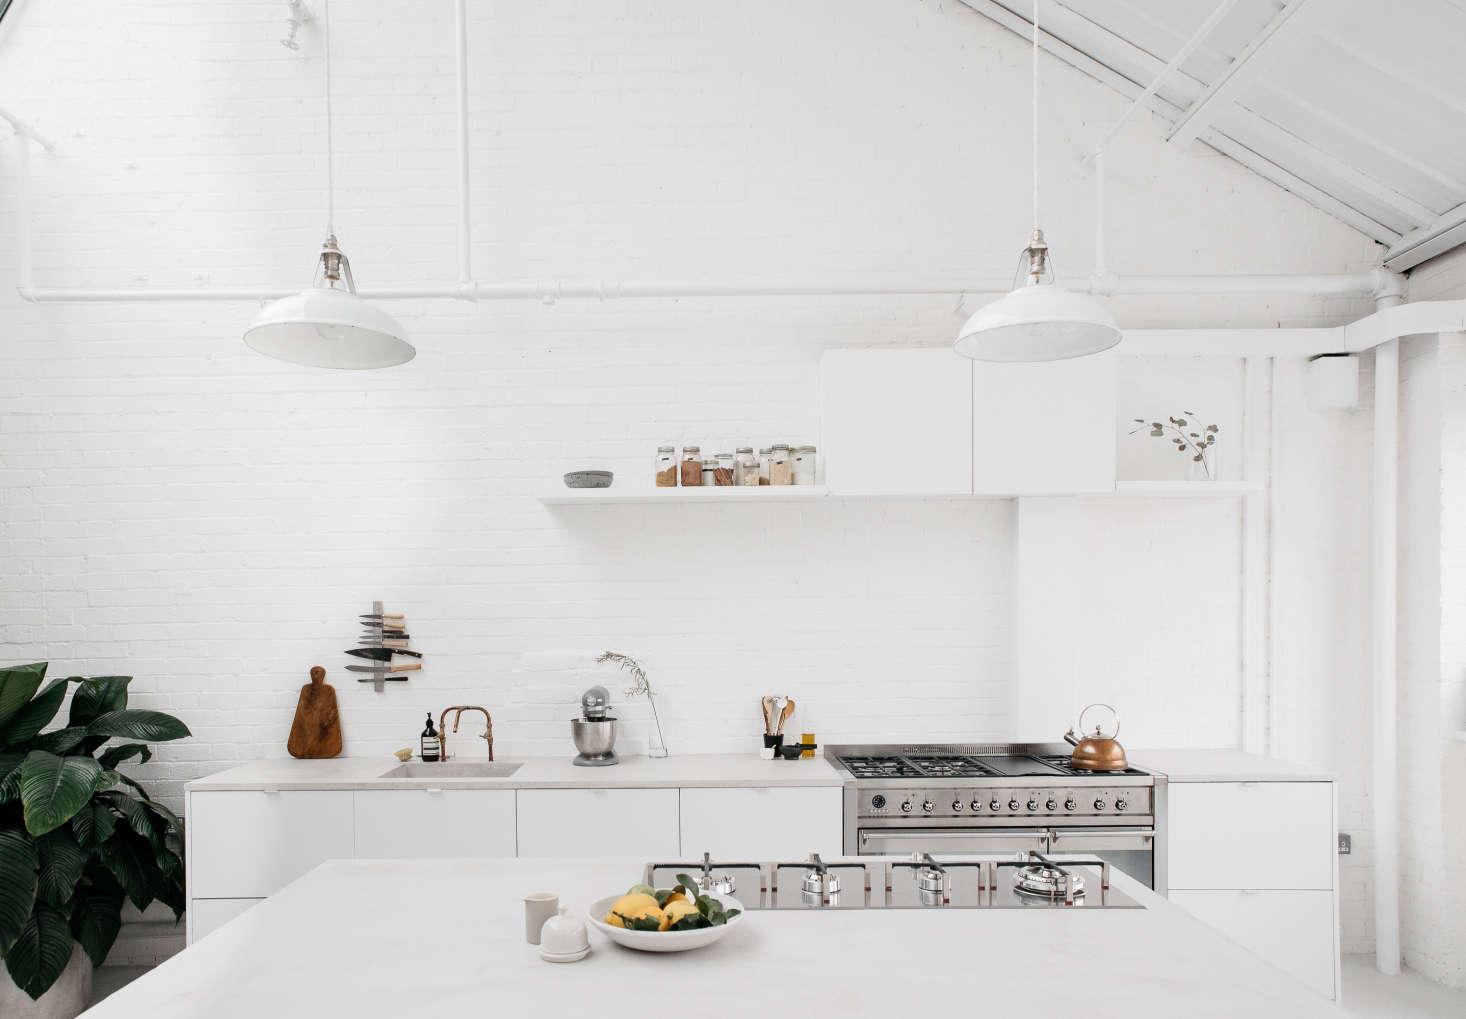 Photography studio Rye London was built with Ikea&#8